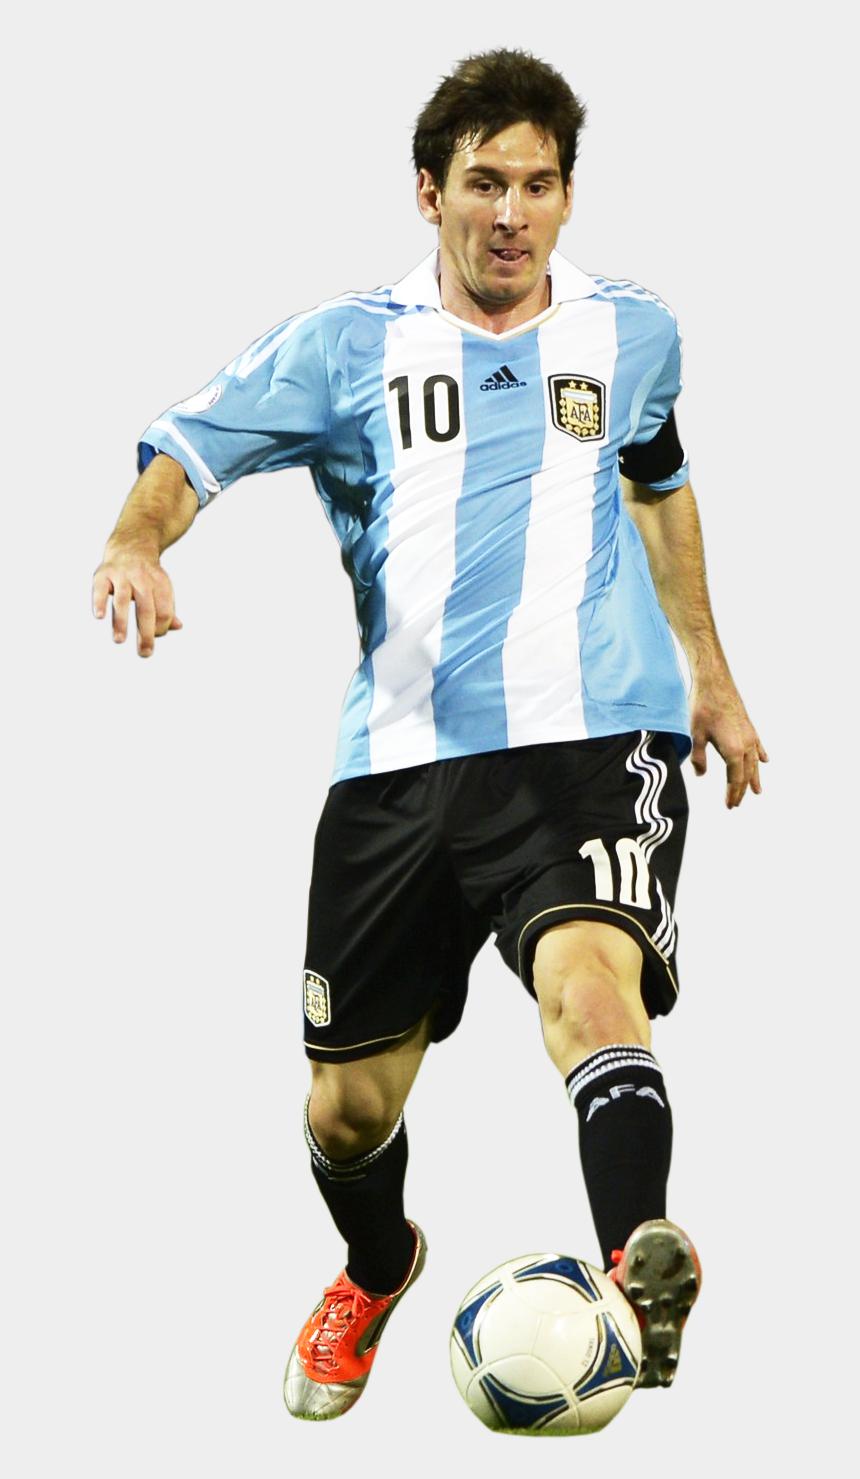 barcelona clipart, Cartoons - Fifa Cup Messi National Football Barcelona Fc Clipart - Lionel Messi Argentina Png